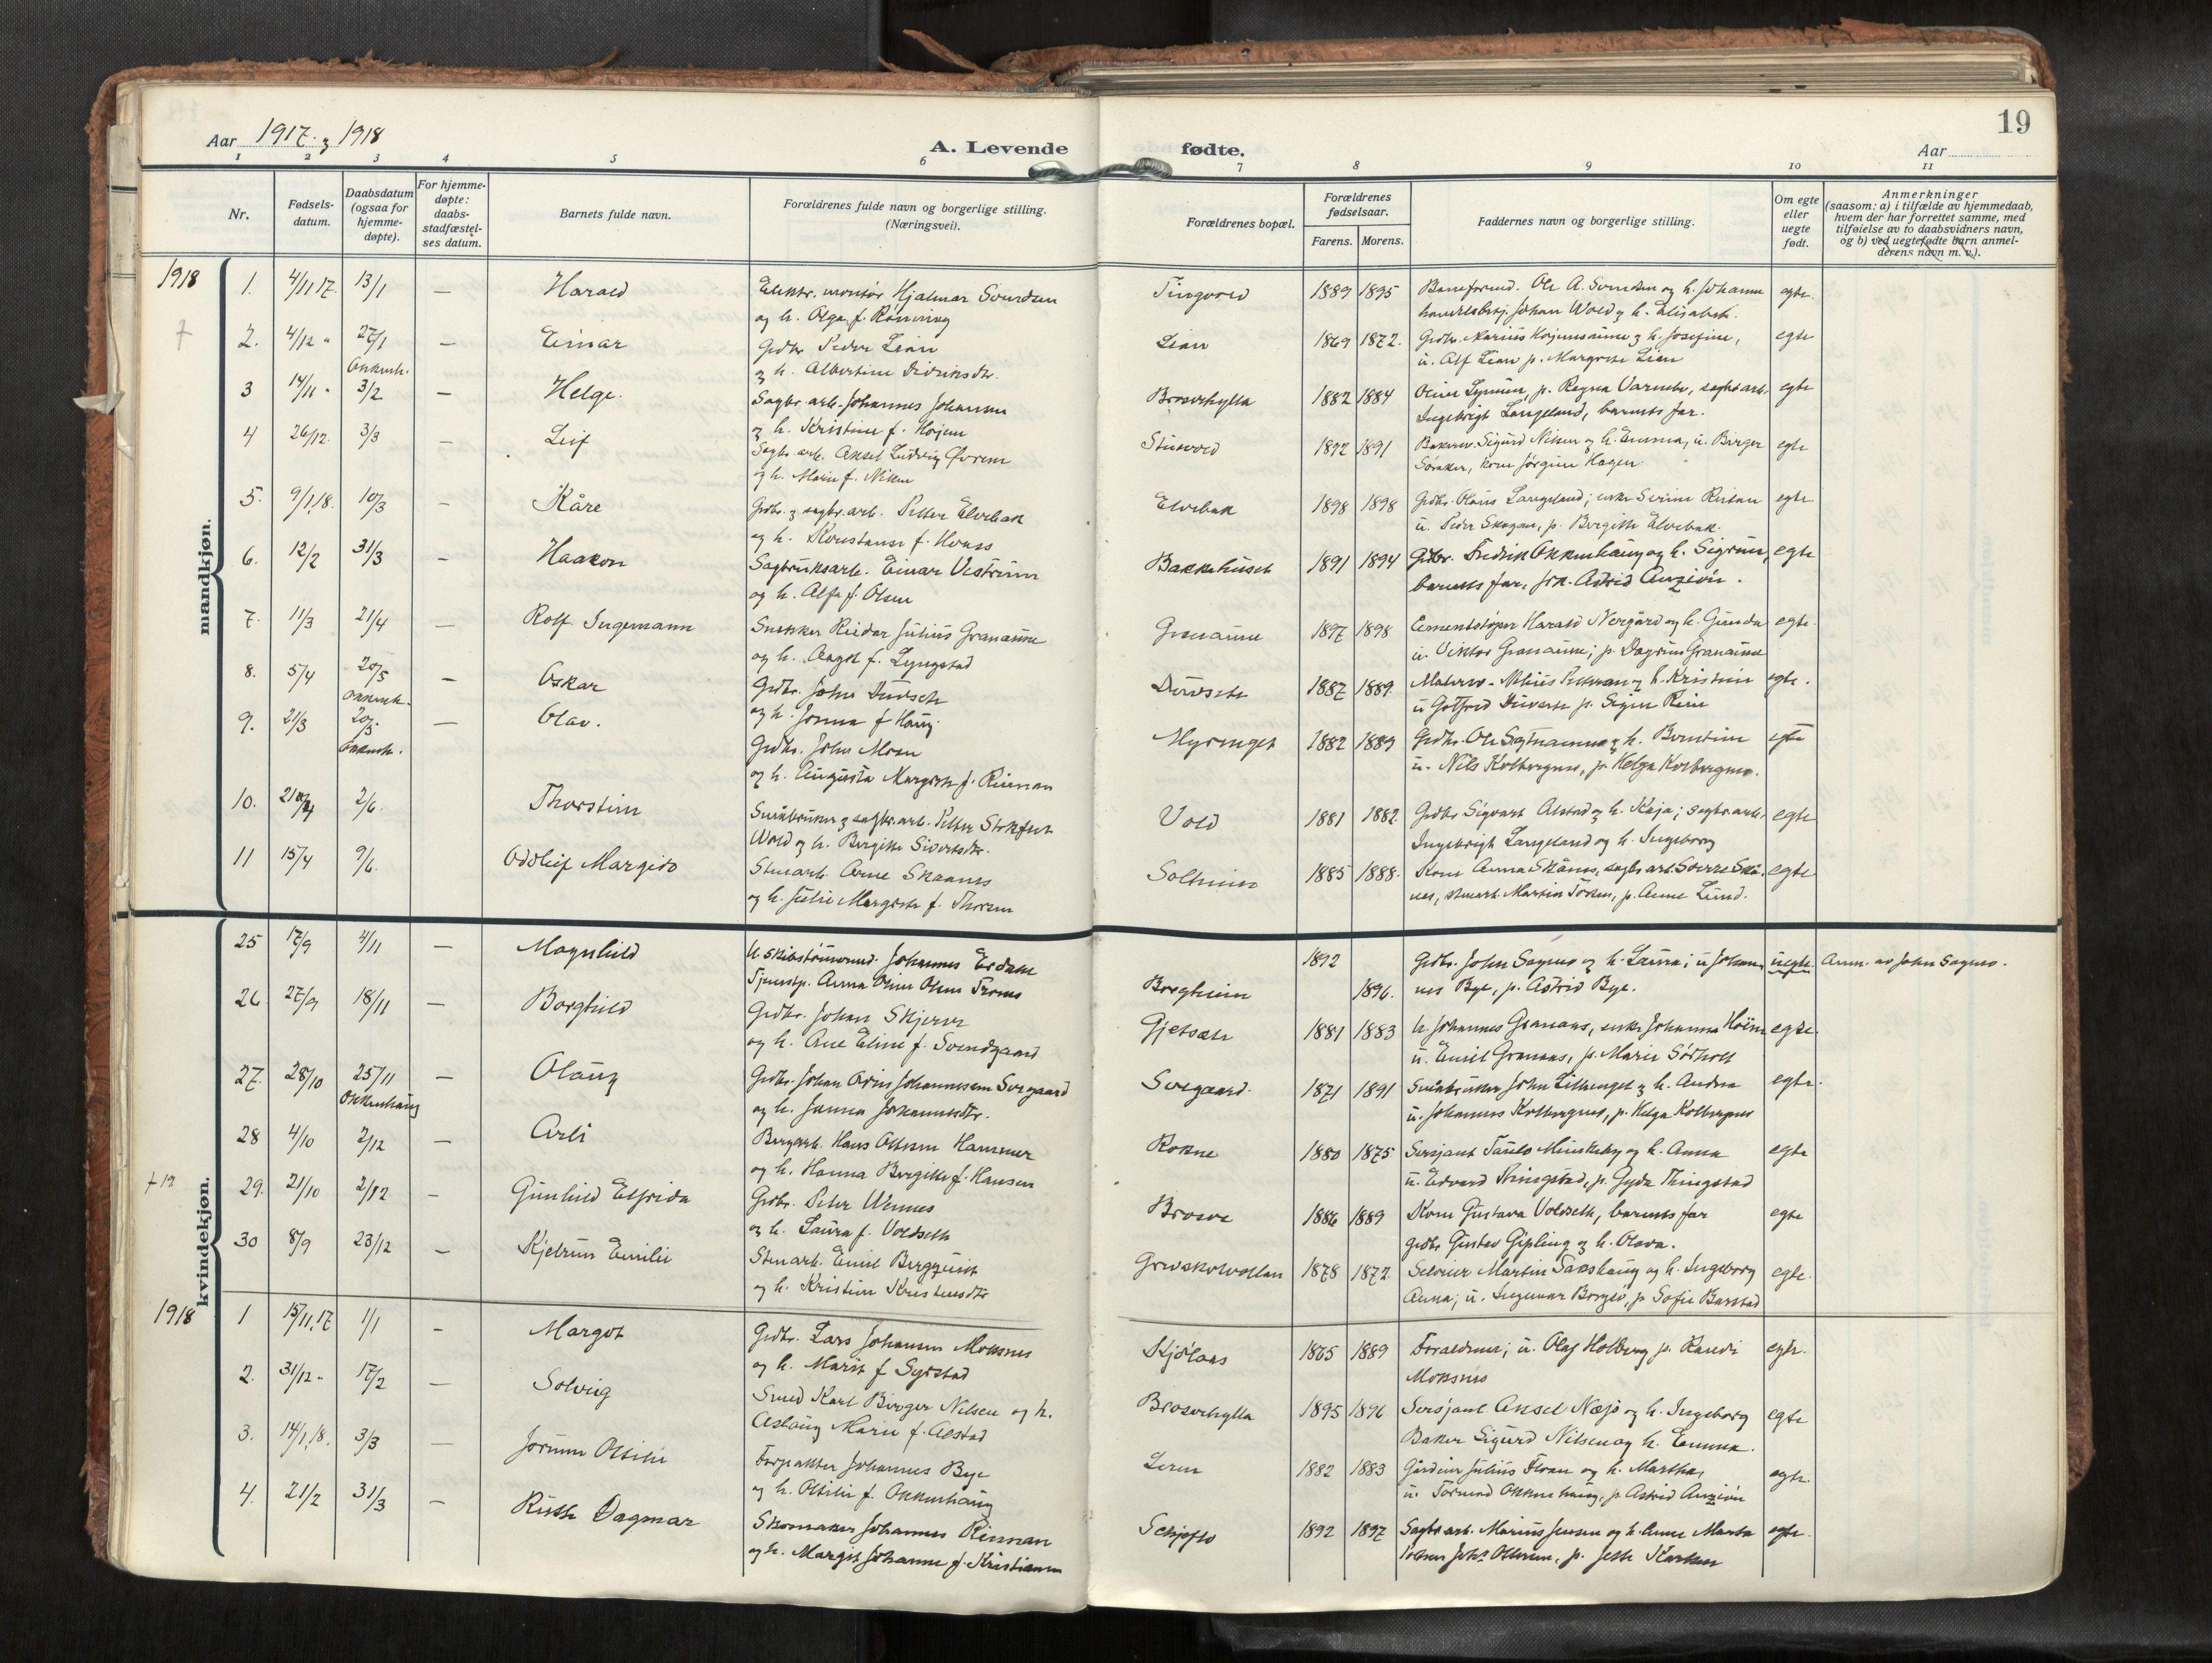 SAT, Levanger sokneprestkontor*, Parish register (official) no. 1, 1912-1935, p. 19